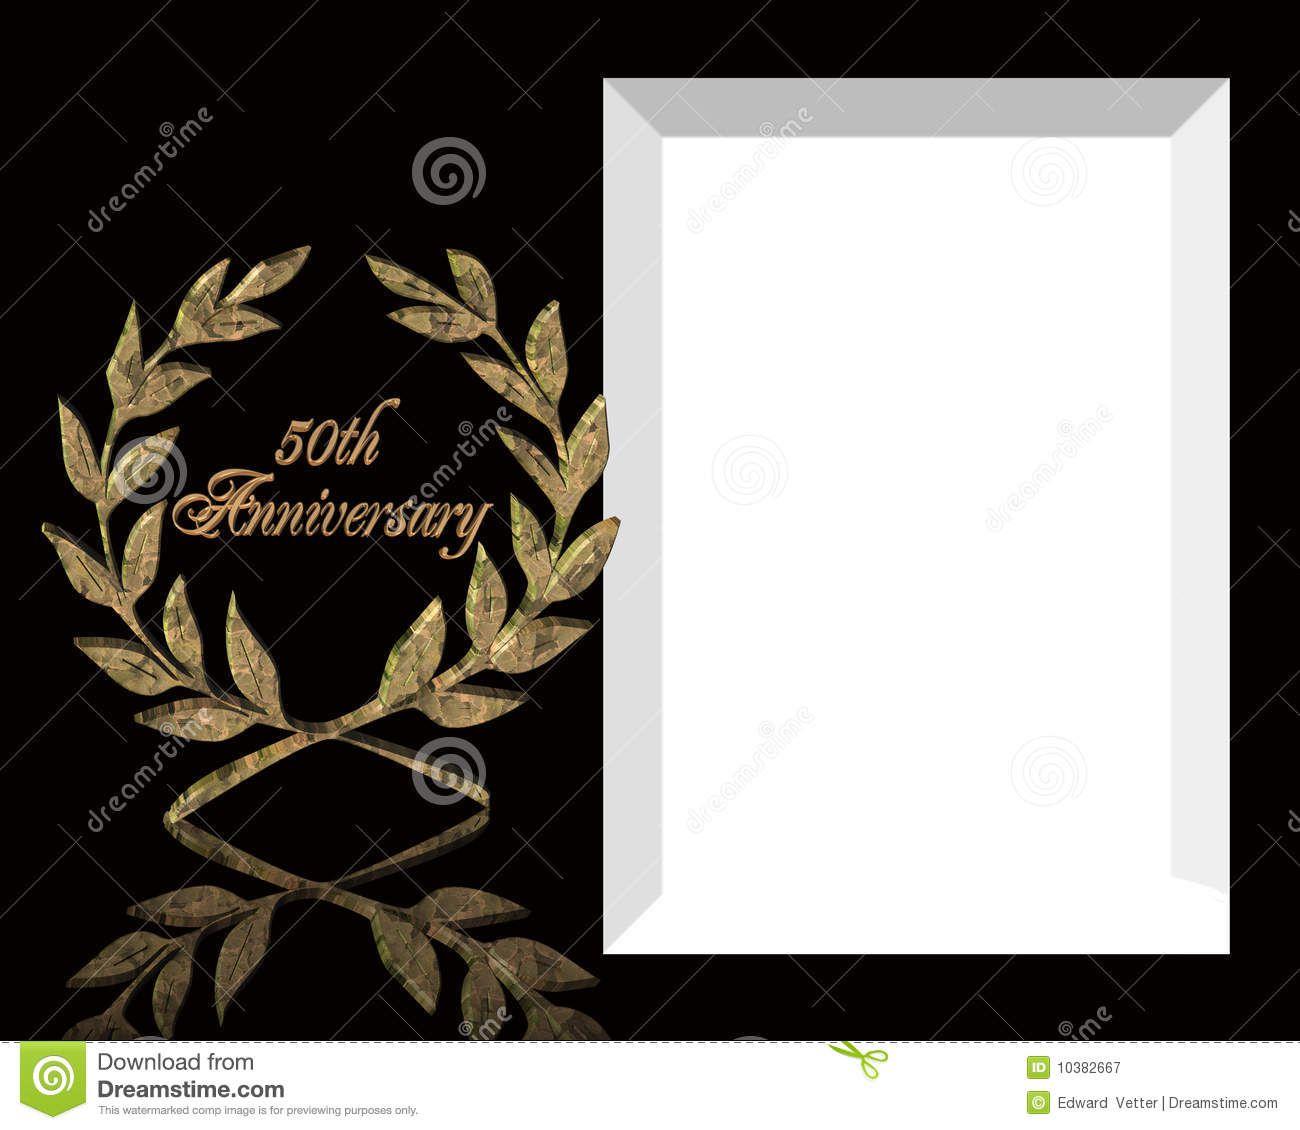 005 Surprising Golden Wedding Anniversary Invitation Template Free Inspiration  50th Microsoft Word DownloadFull